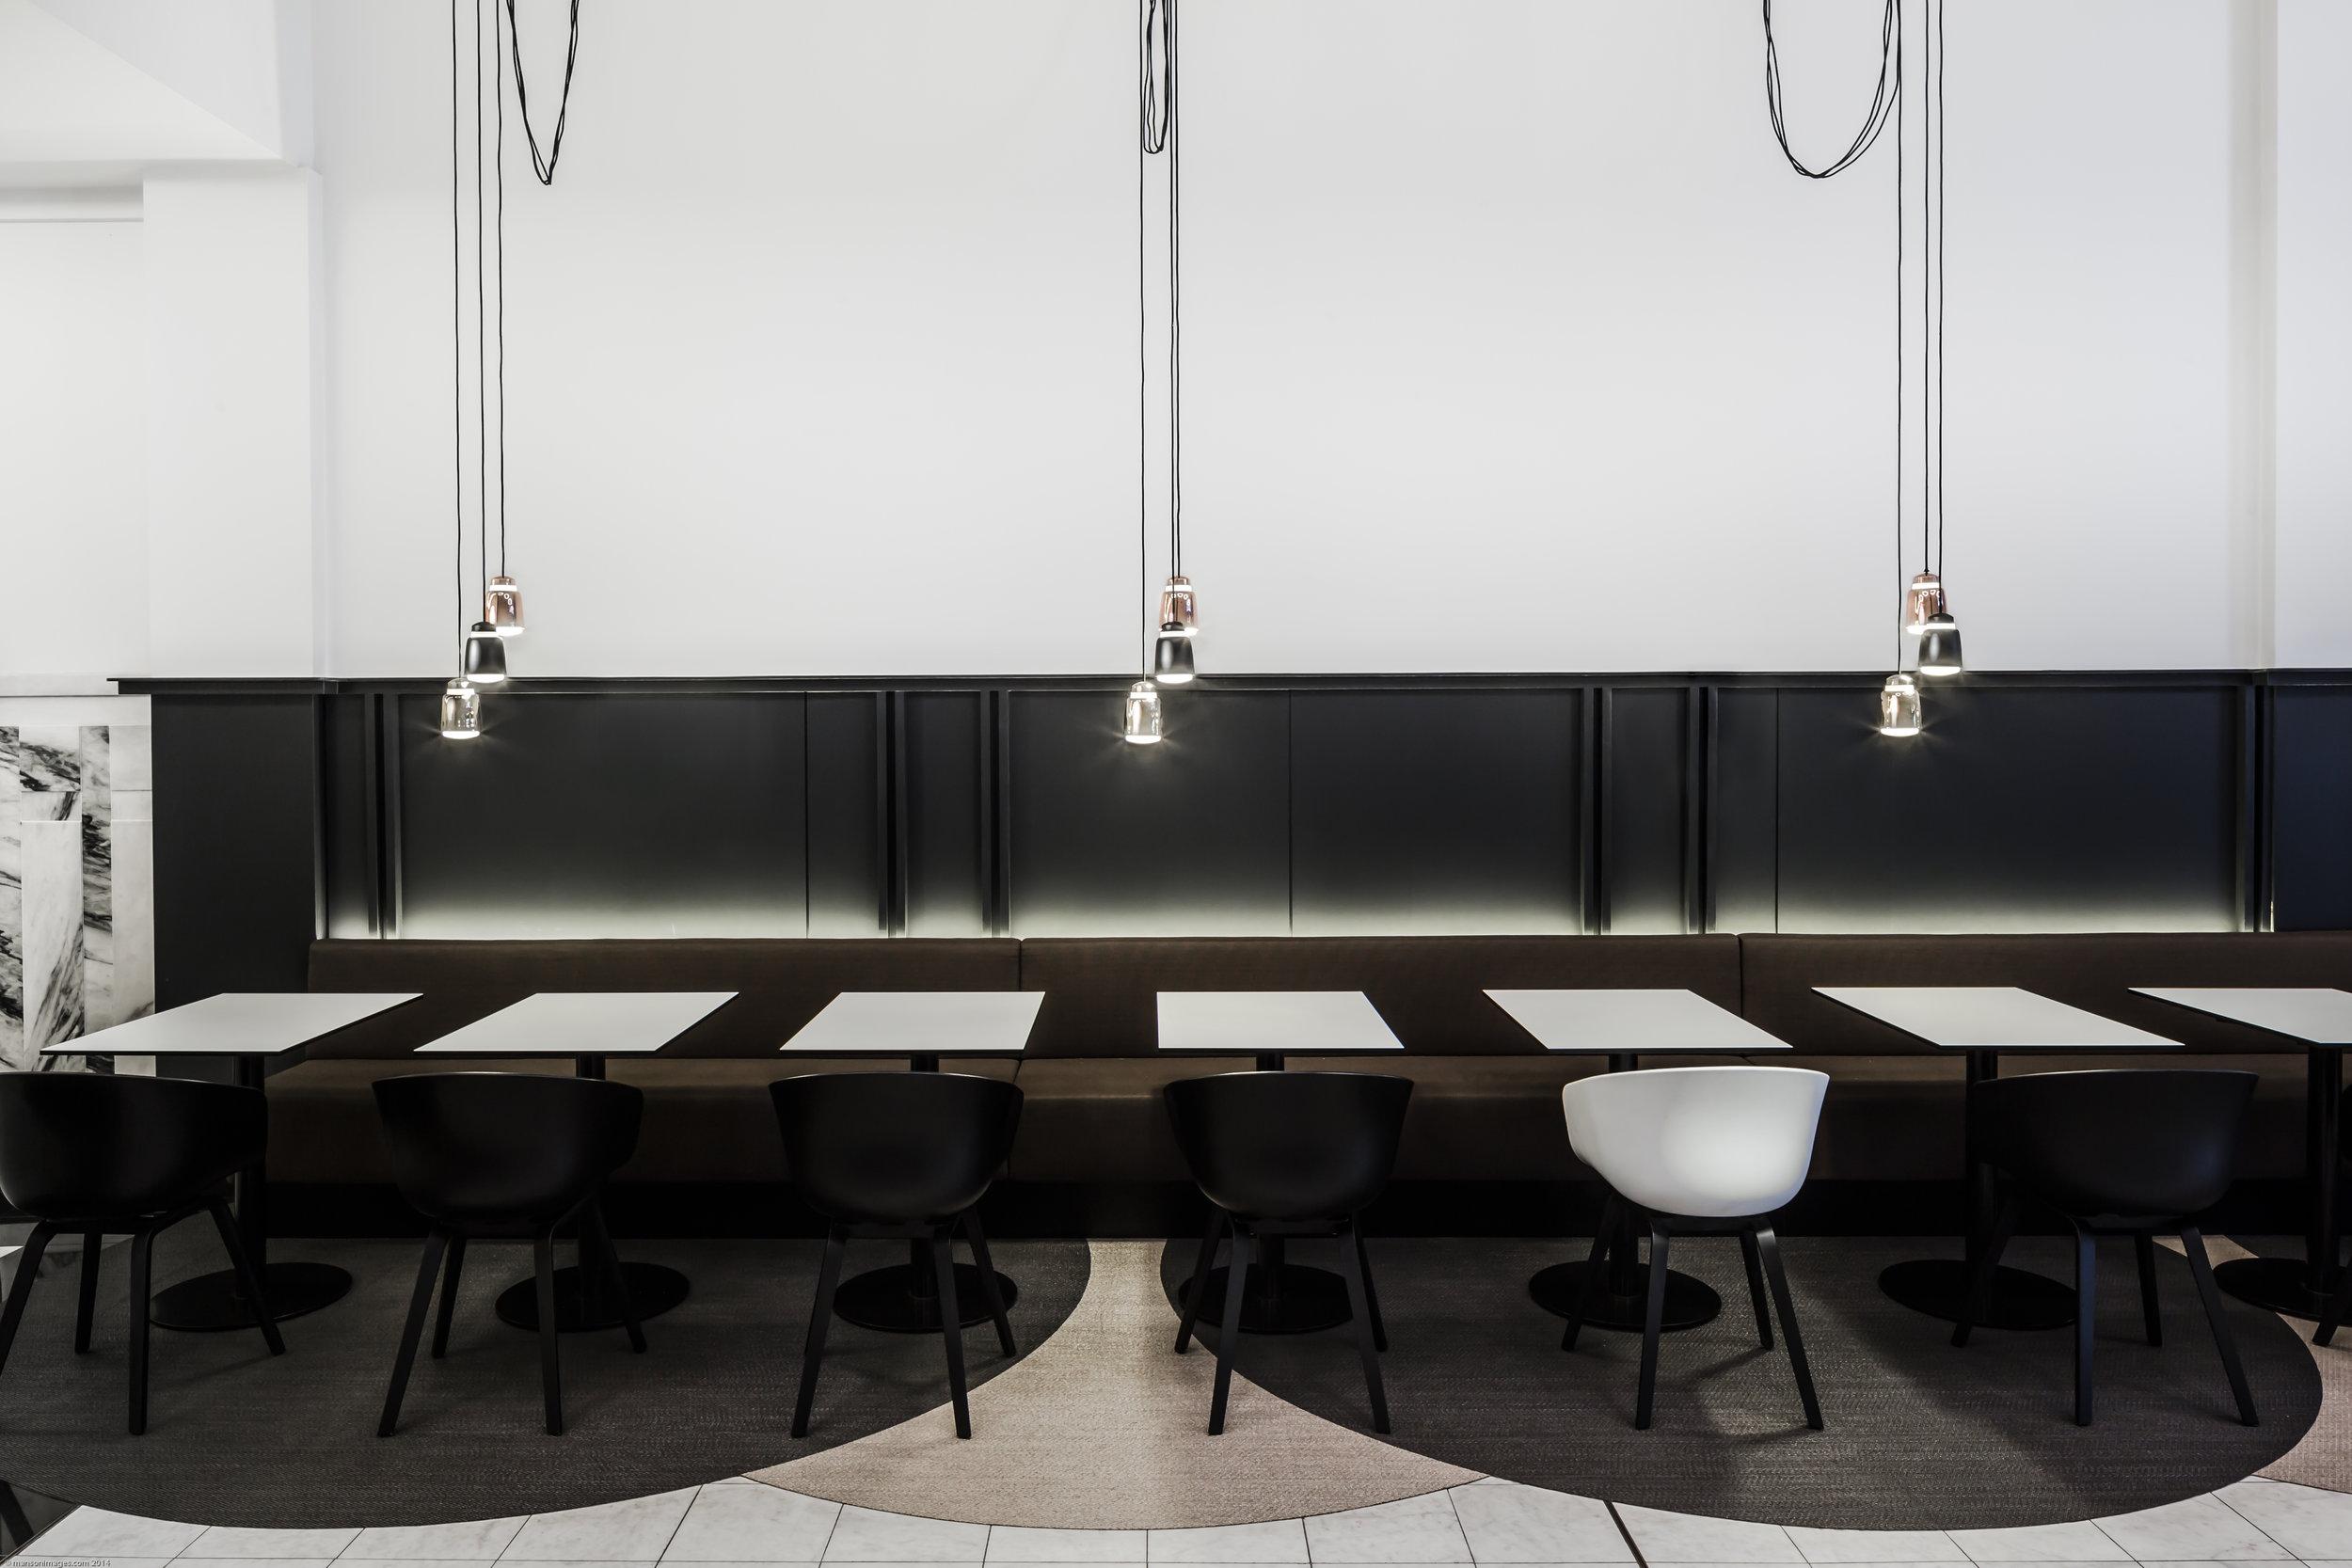 Anzac Square_Banquette Seating